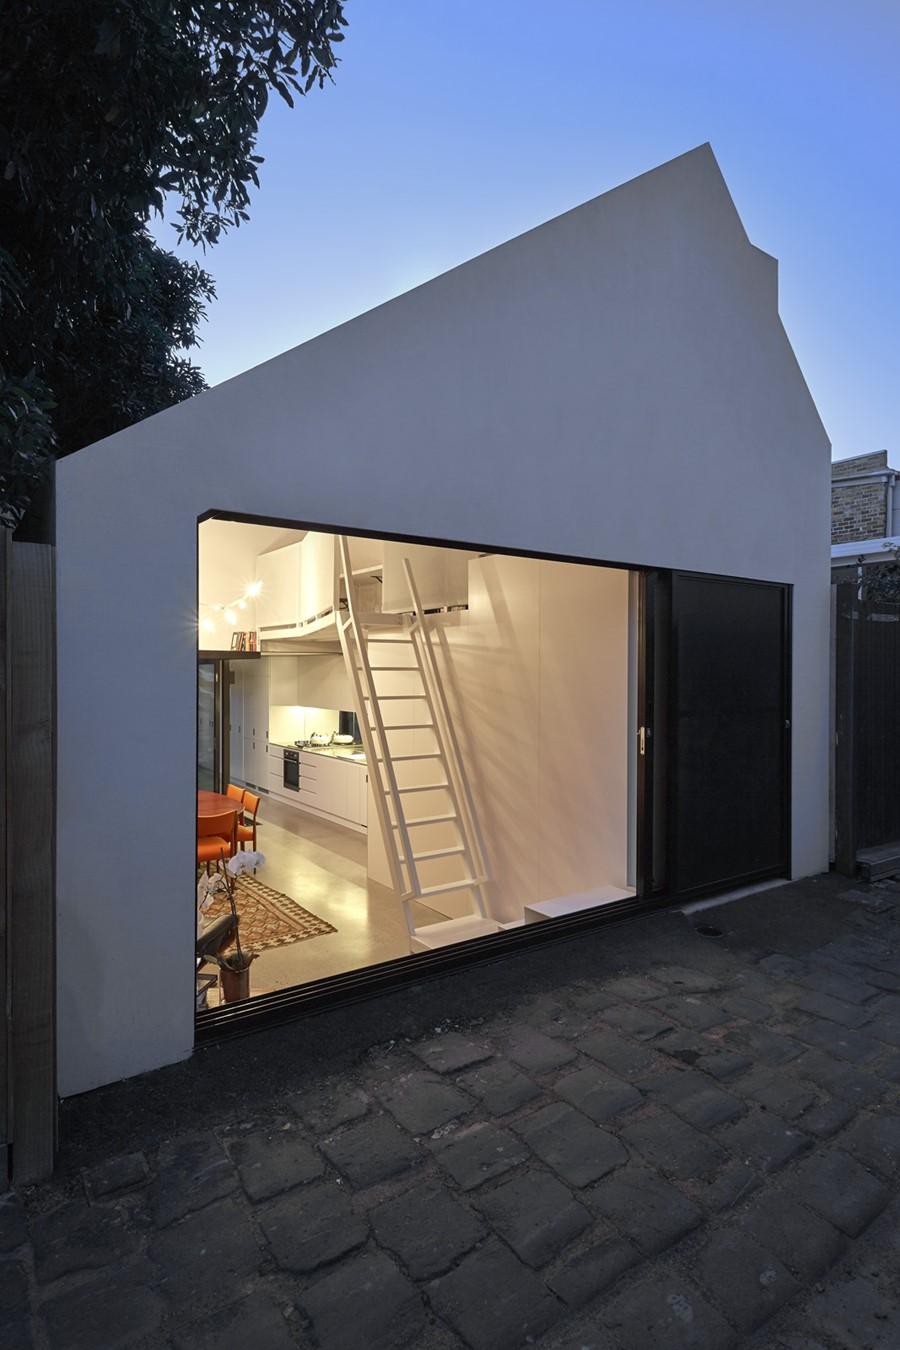 Alfred house by Austin Maynard Architects 01